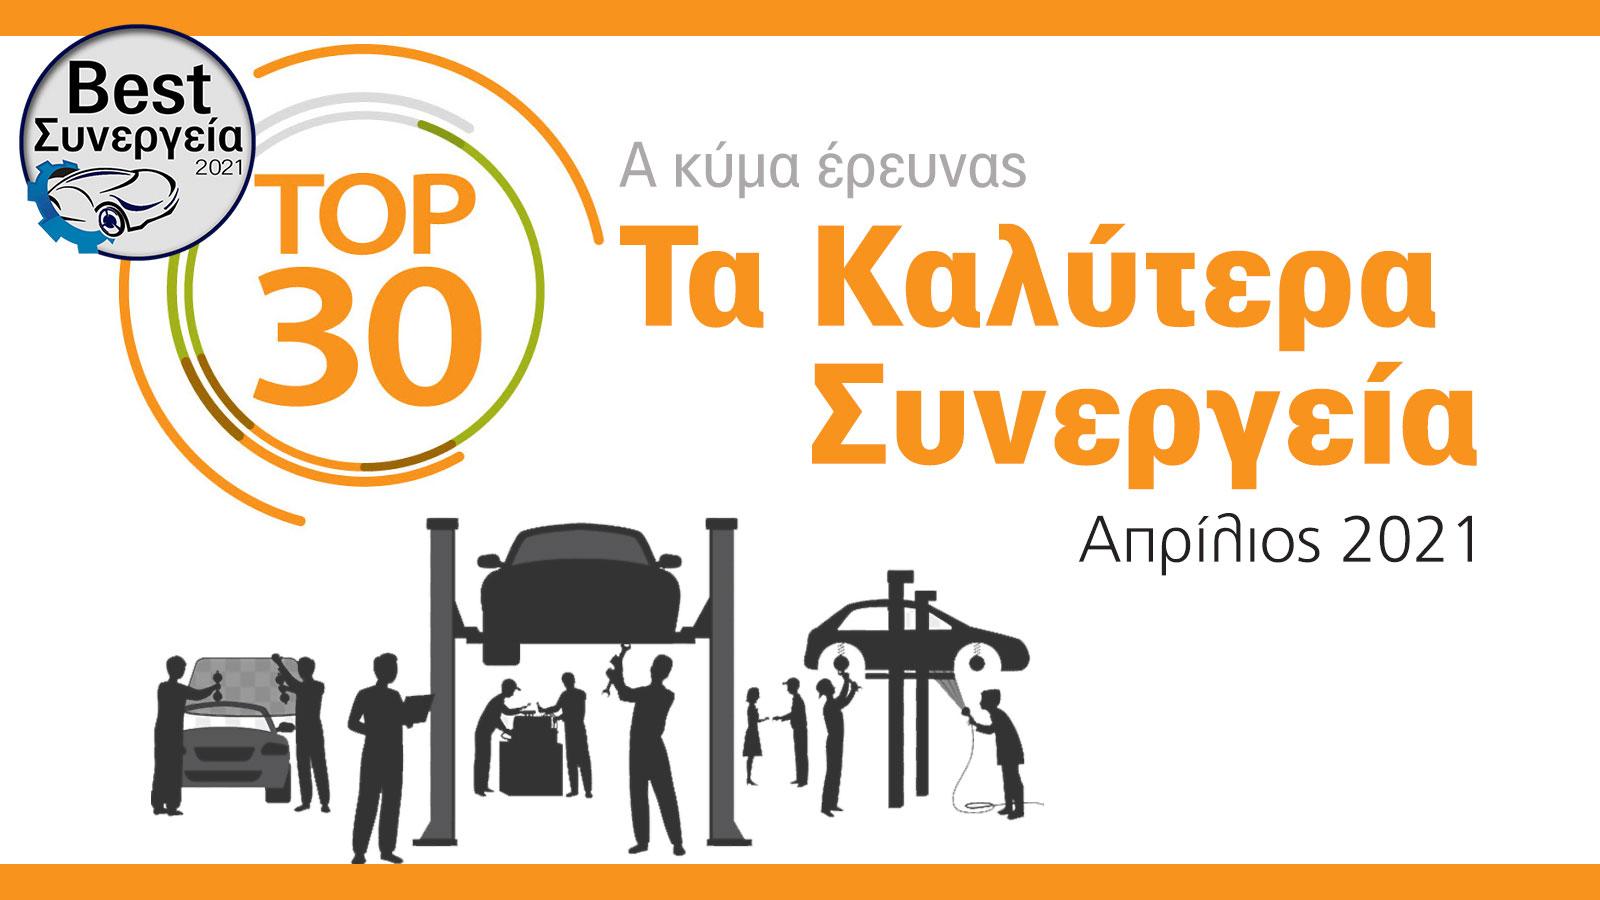 Top 30 το σήμα των Καλύτερων Συνεργείων Αυτοκινήτου, απονέμεται στα Συνεργεία που ξεχώρισαν στον 1ο μήνα ψηφοφορίας στα πλαίσια της έρευνας του Autotriti – Best Συνεργεία 2021.